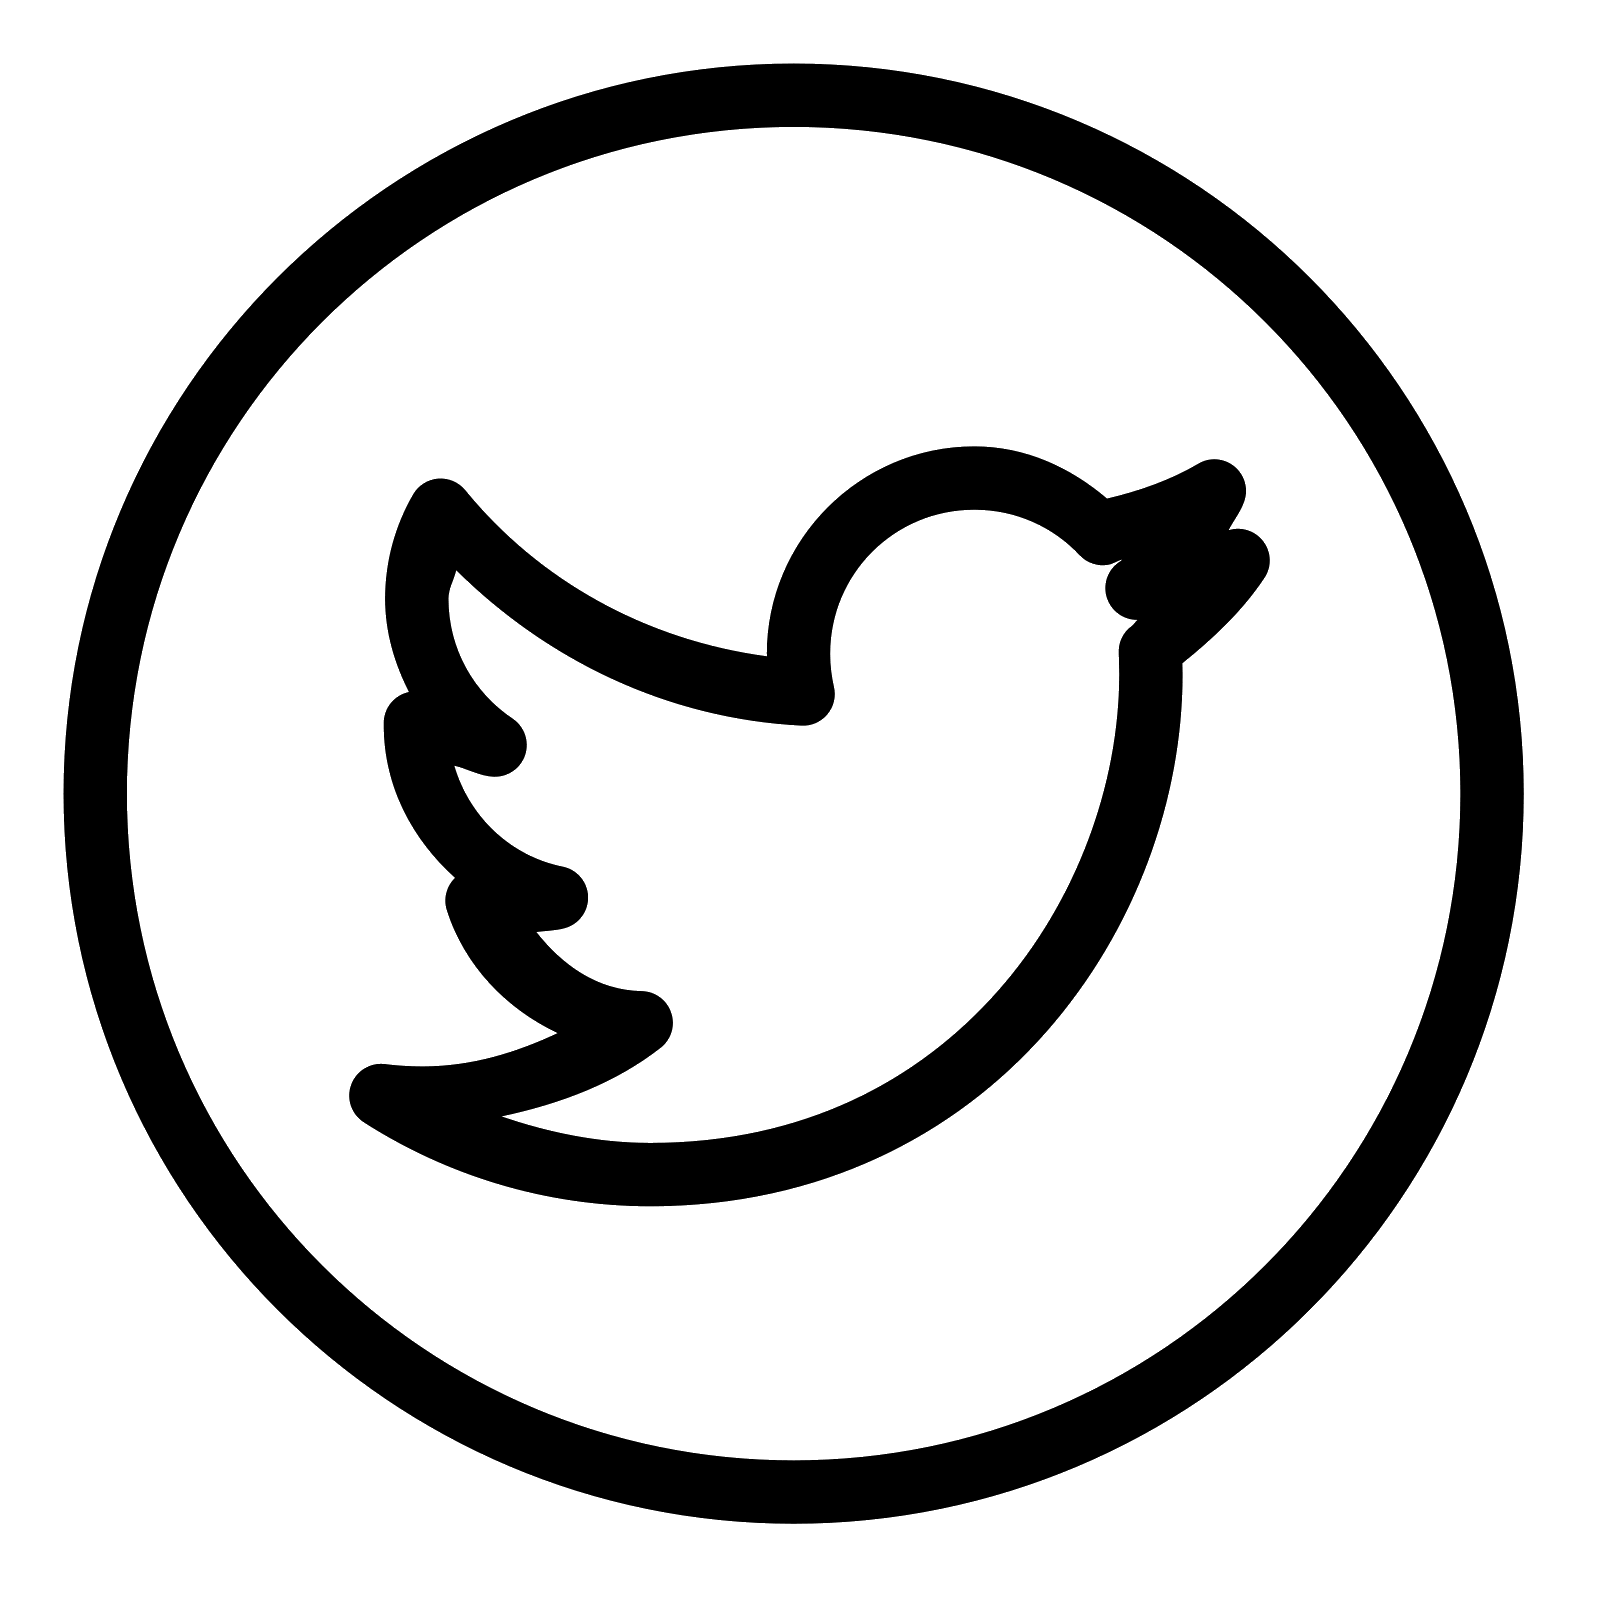 500 twitter logo latest twitter logo icon gif